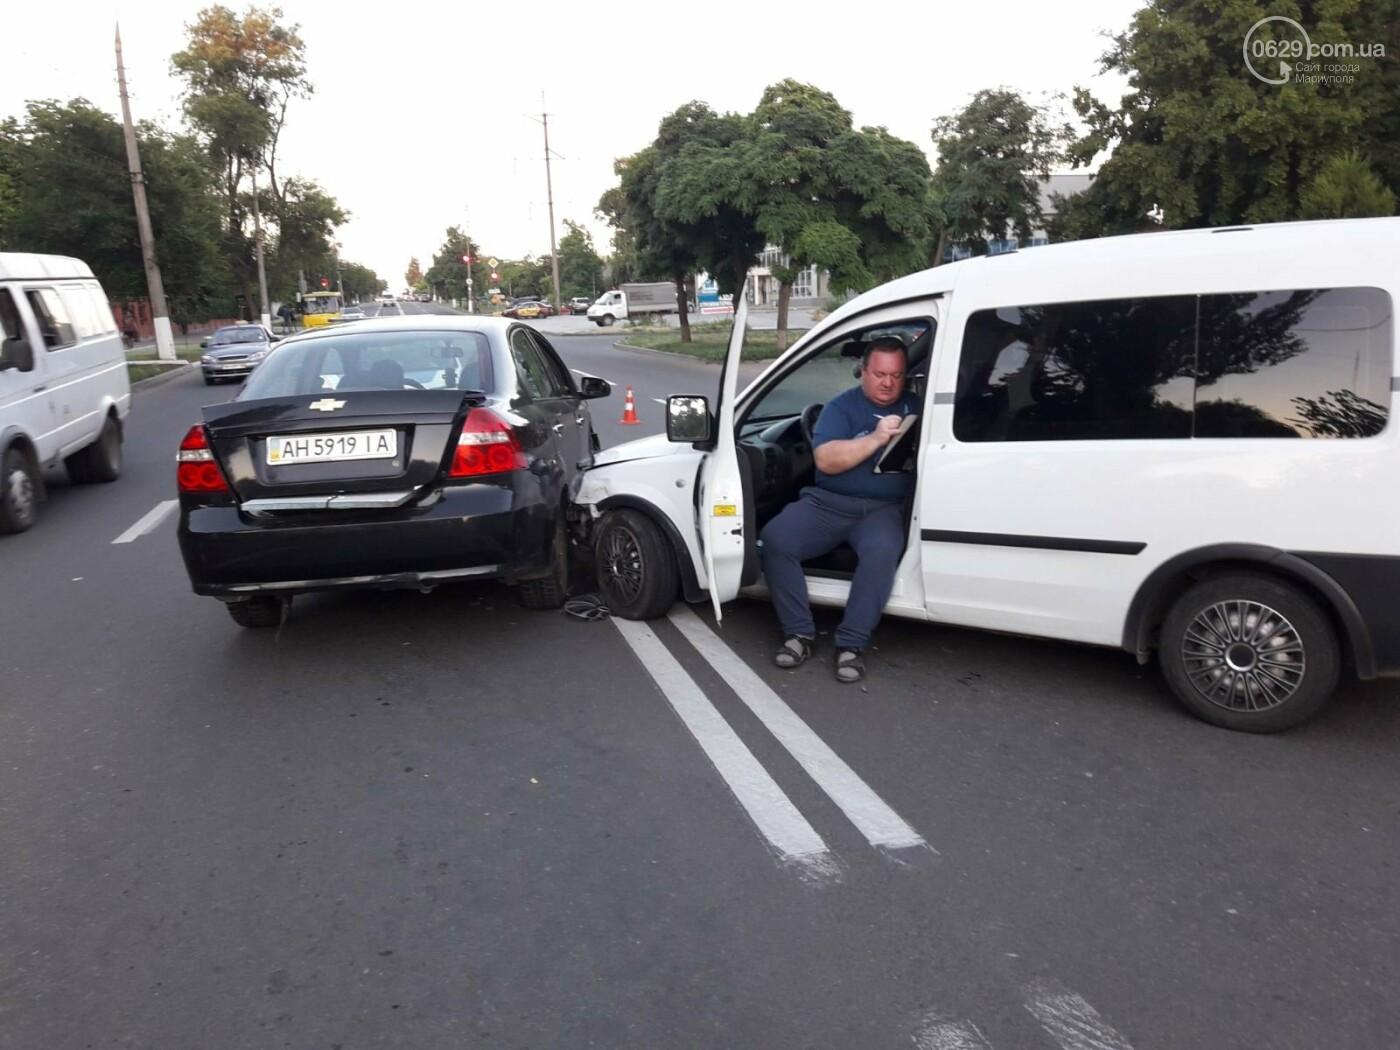 Дубль два! На Митрополитской снова столкнулись два авто, - ФОТО, фото-4